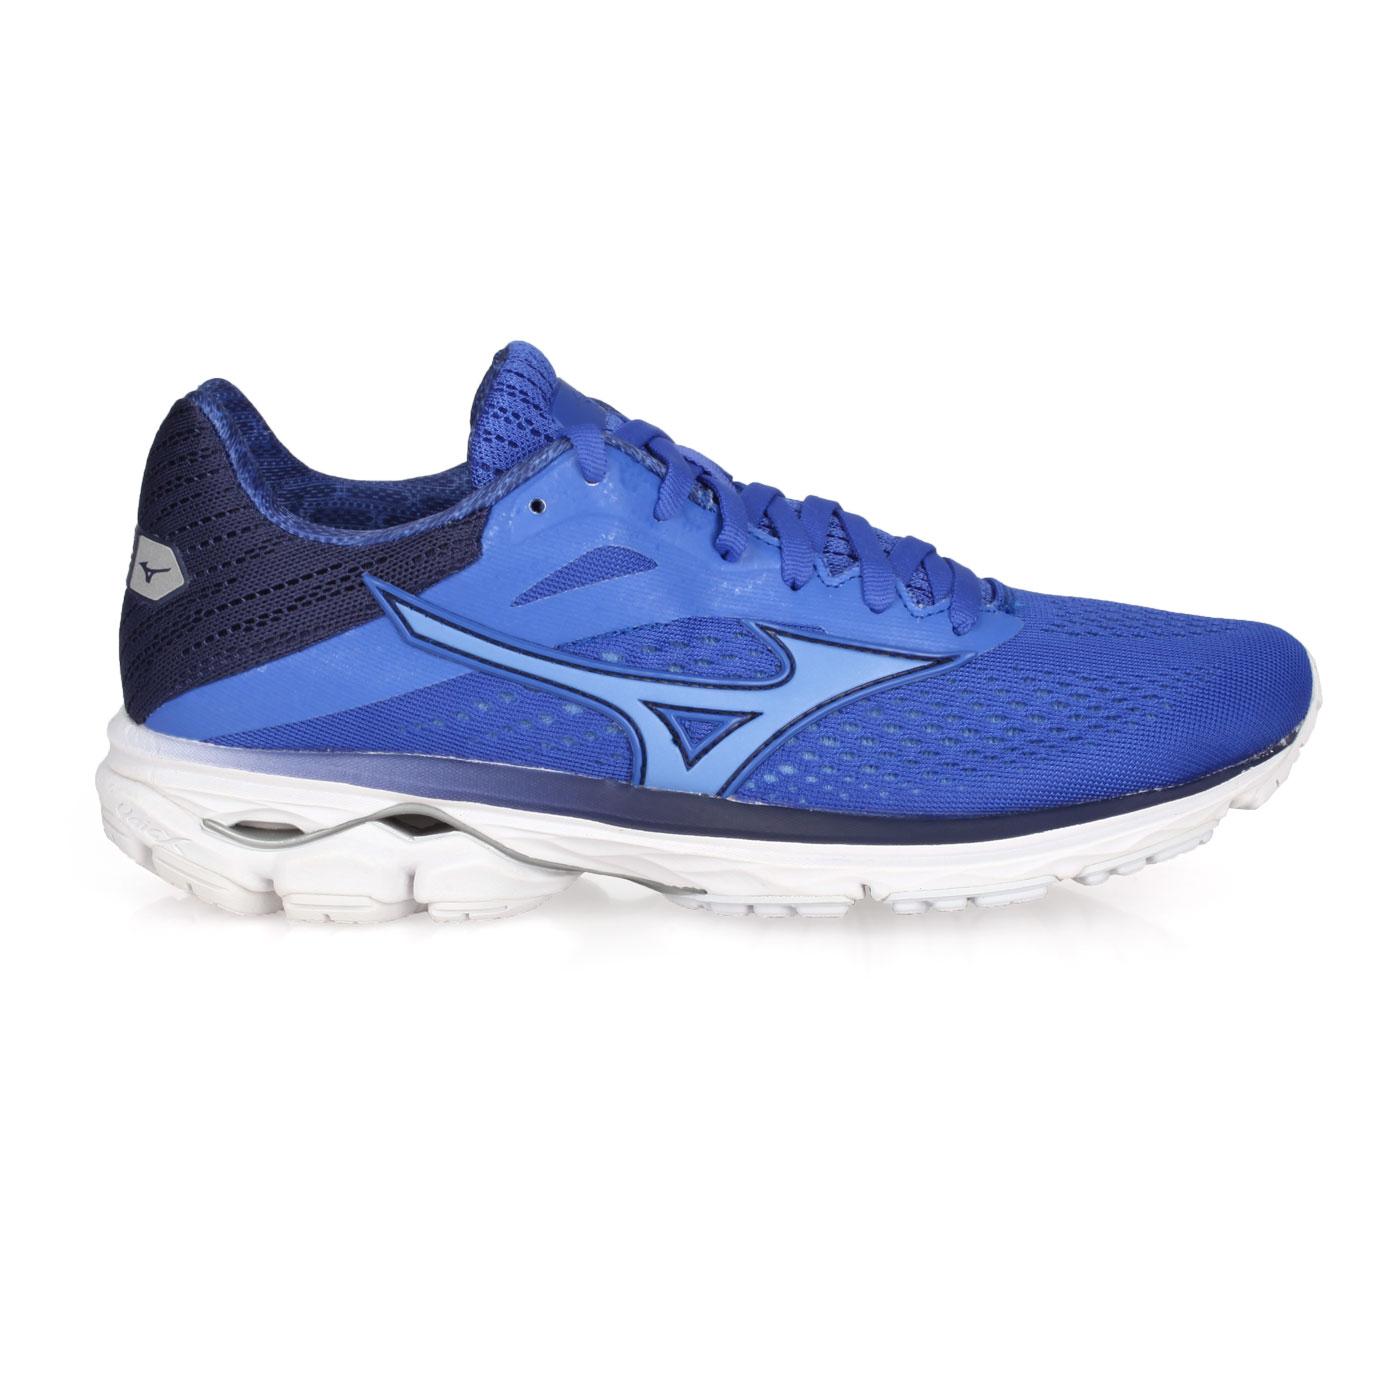 MIZUNO 女款慢跑鞋  @WAVE RIDER 23@J1GD190330 - 藍紫丈青